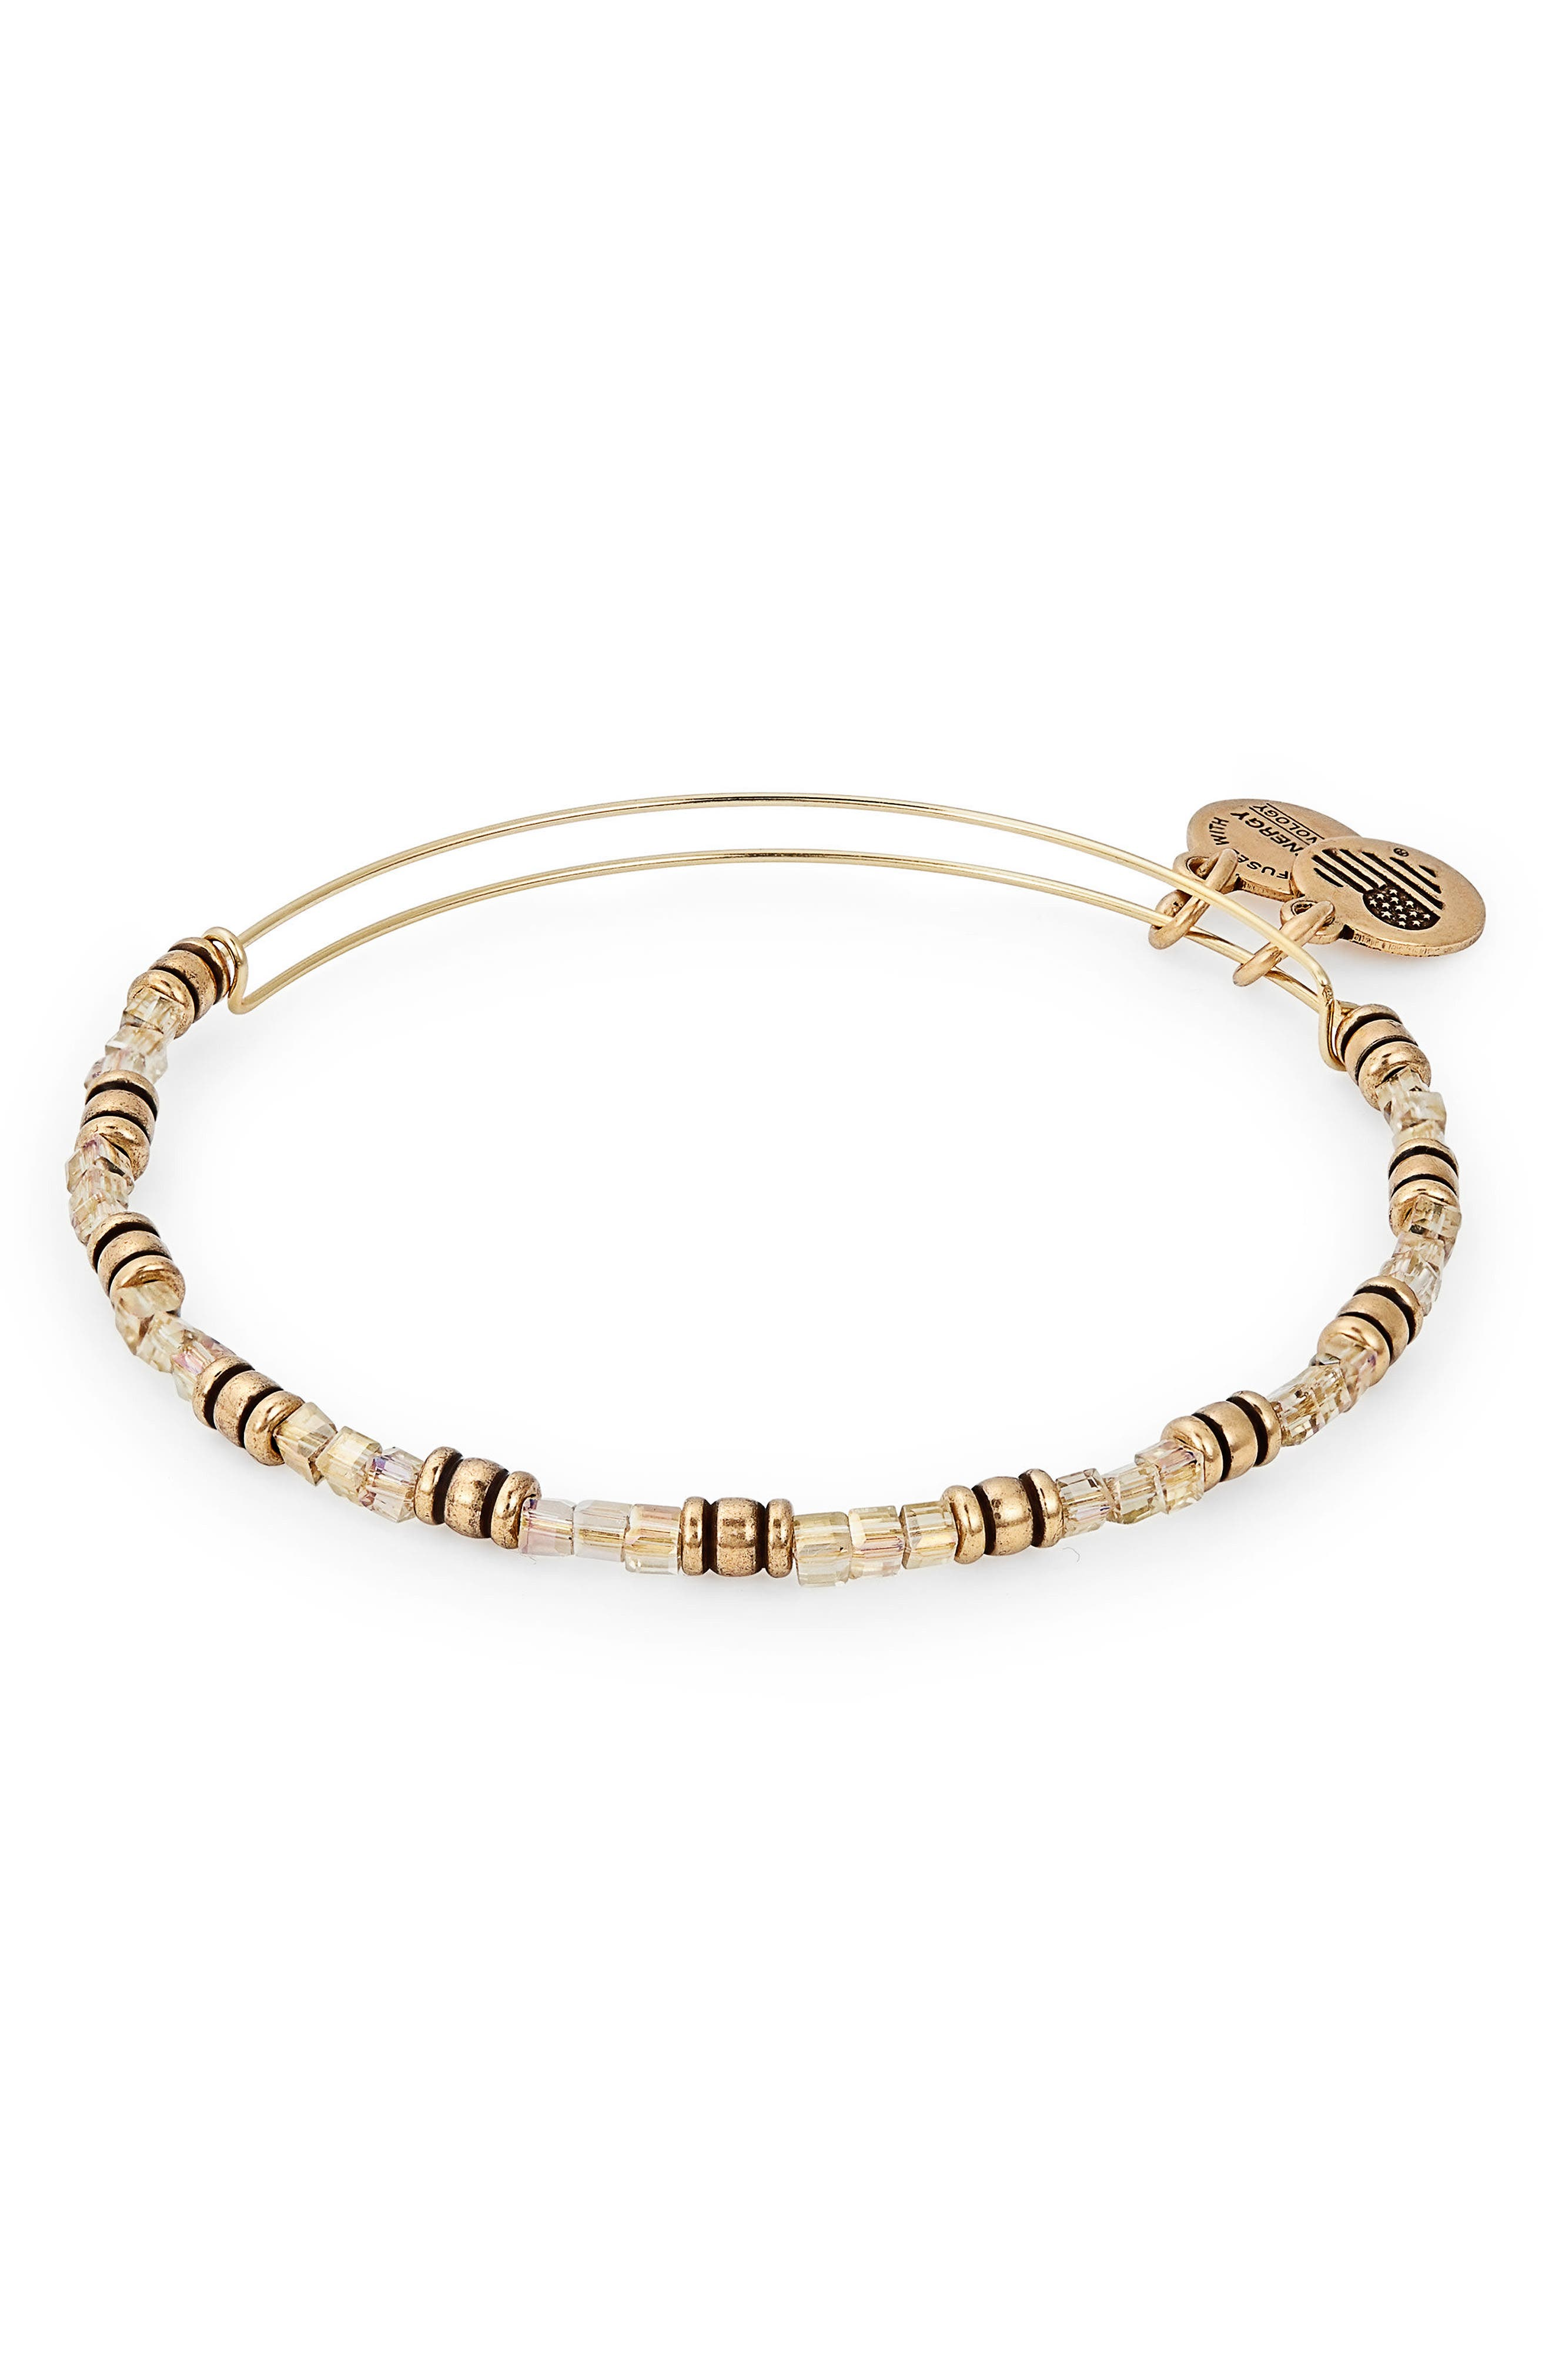 Coastal Sunlight Expandable Beaded Bracelet,                             Main thumbnail 1, color,                             Gold